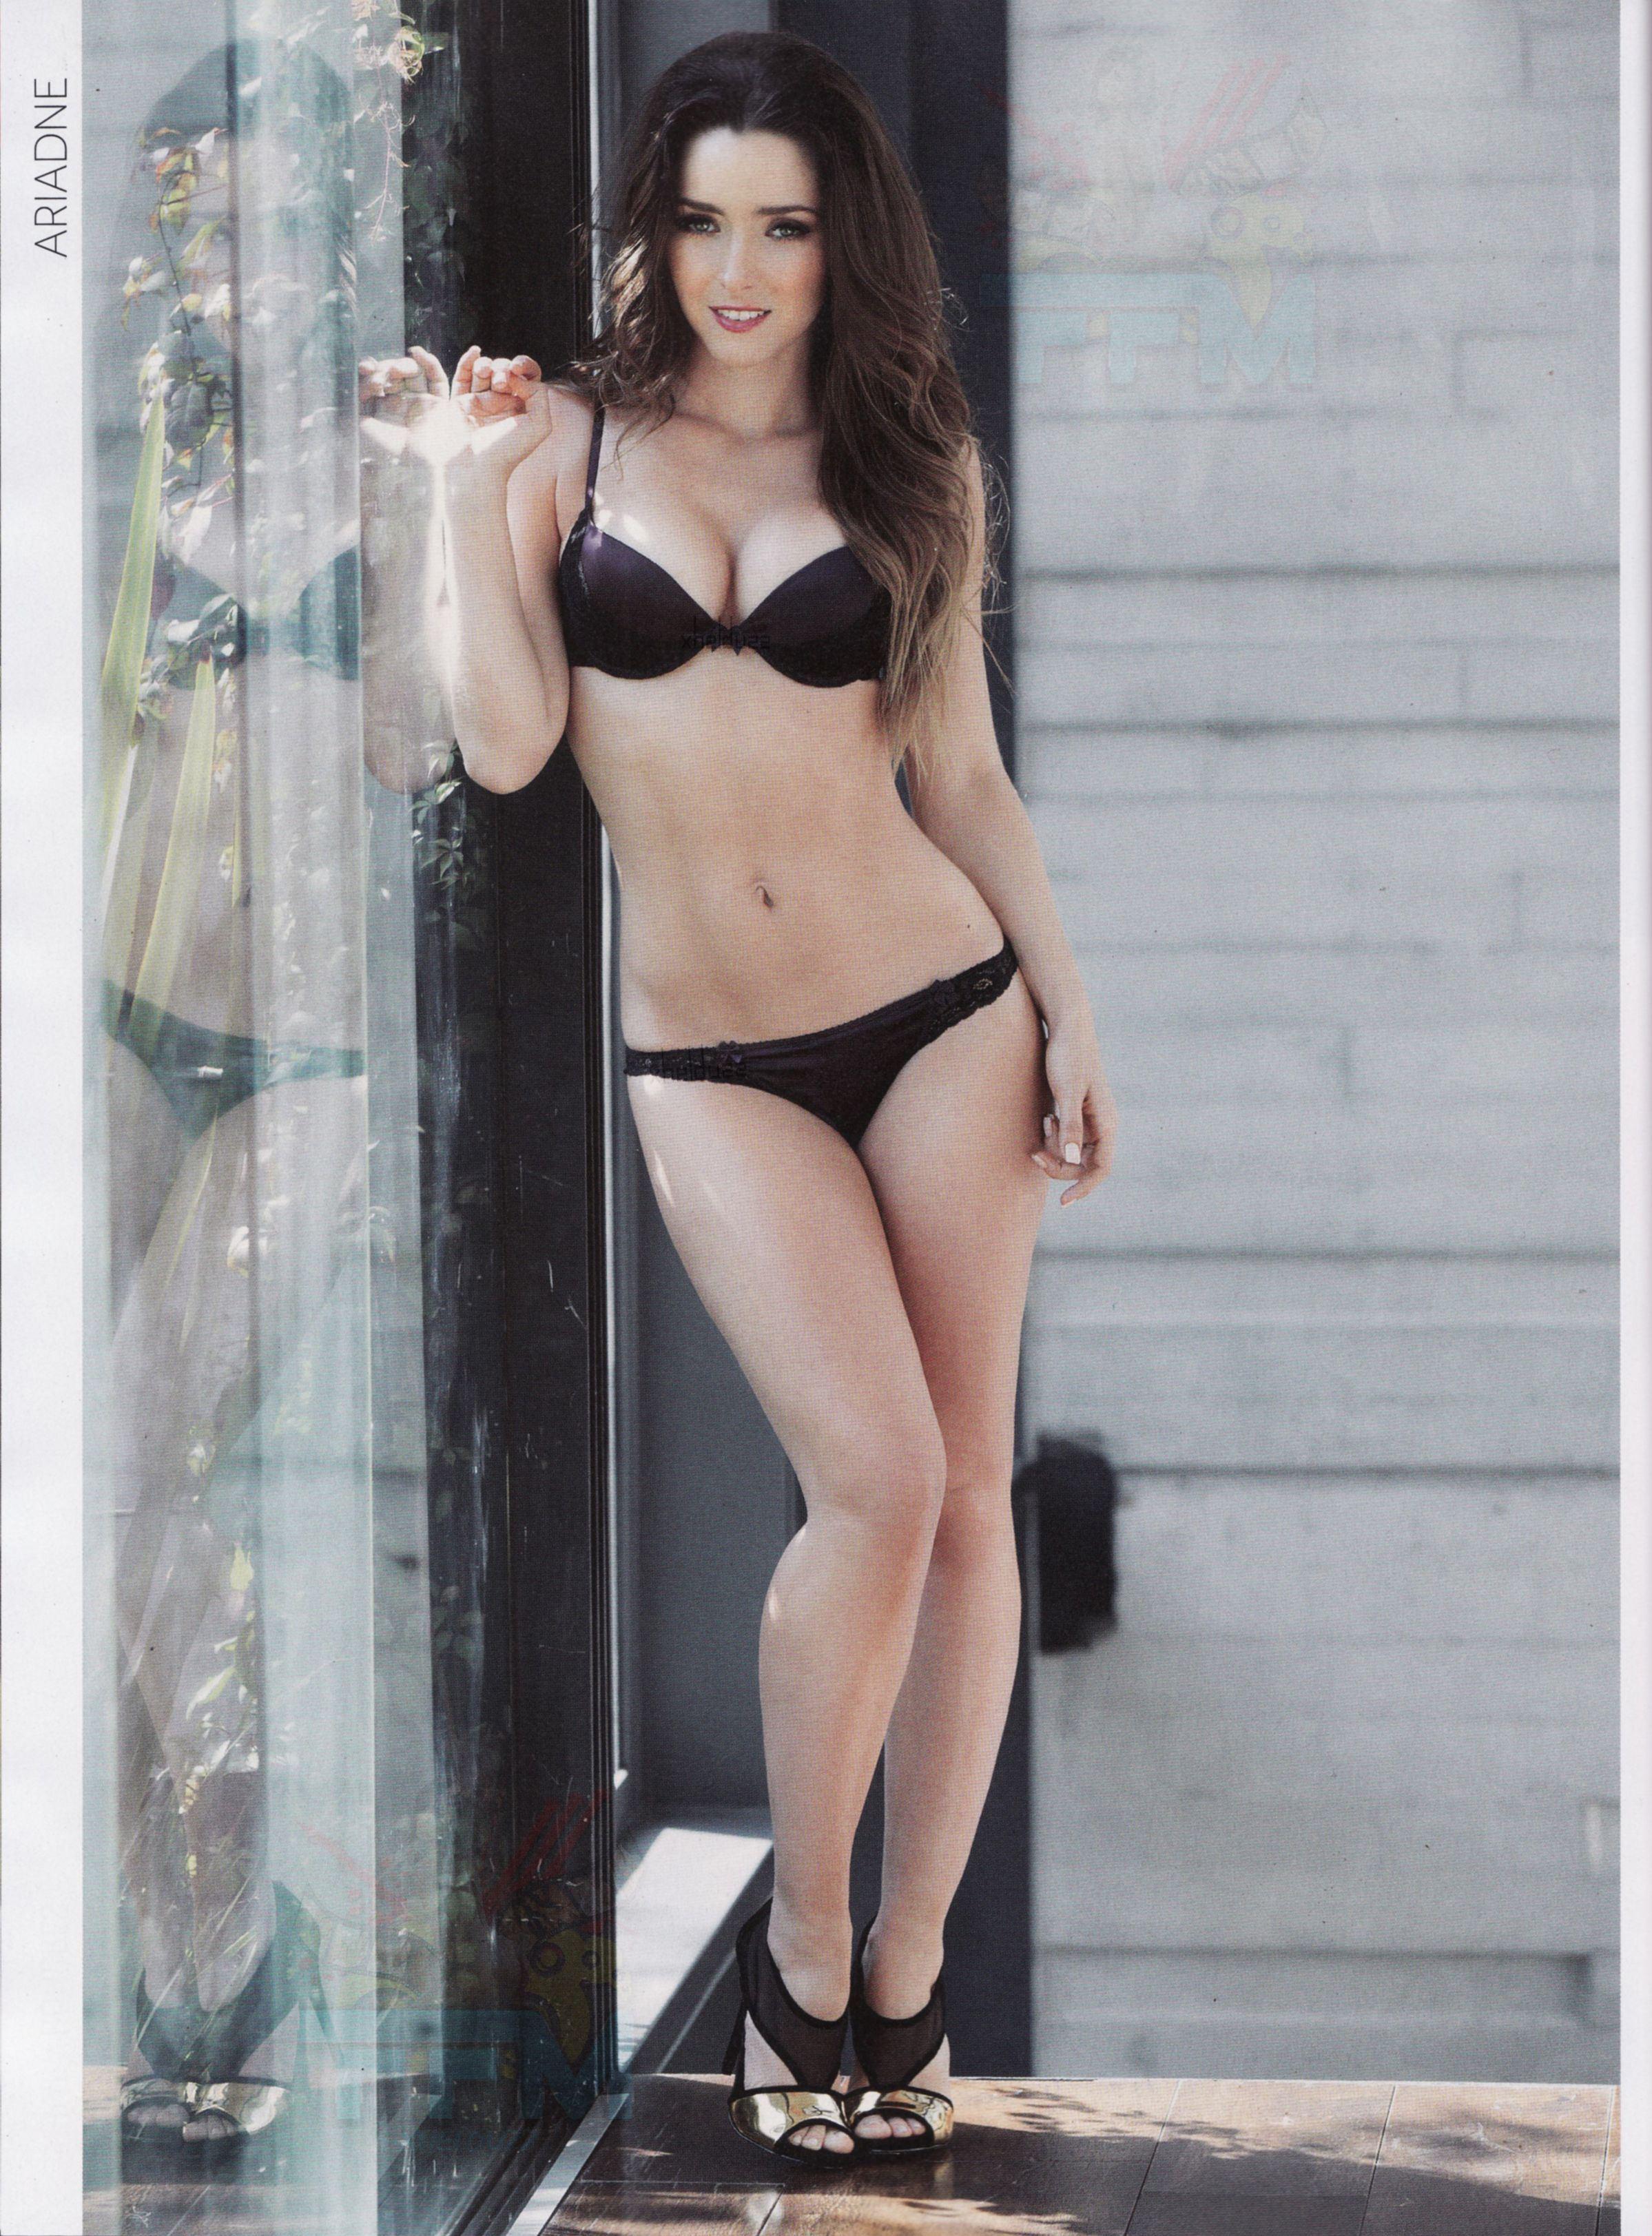 Ariadne diaz porn photoshop - Adult videos.